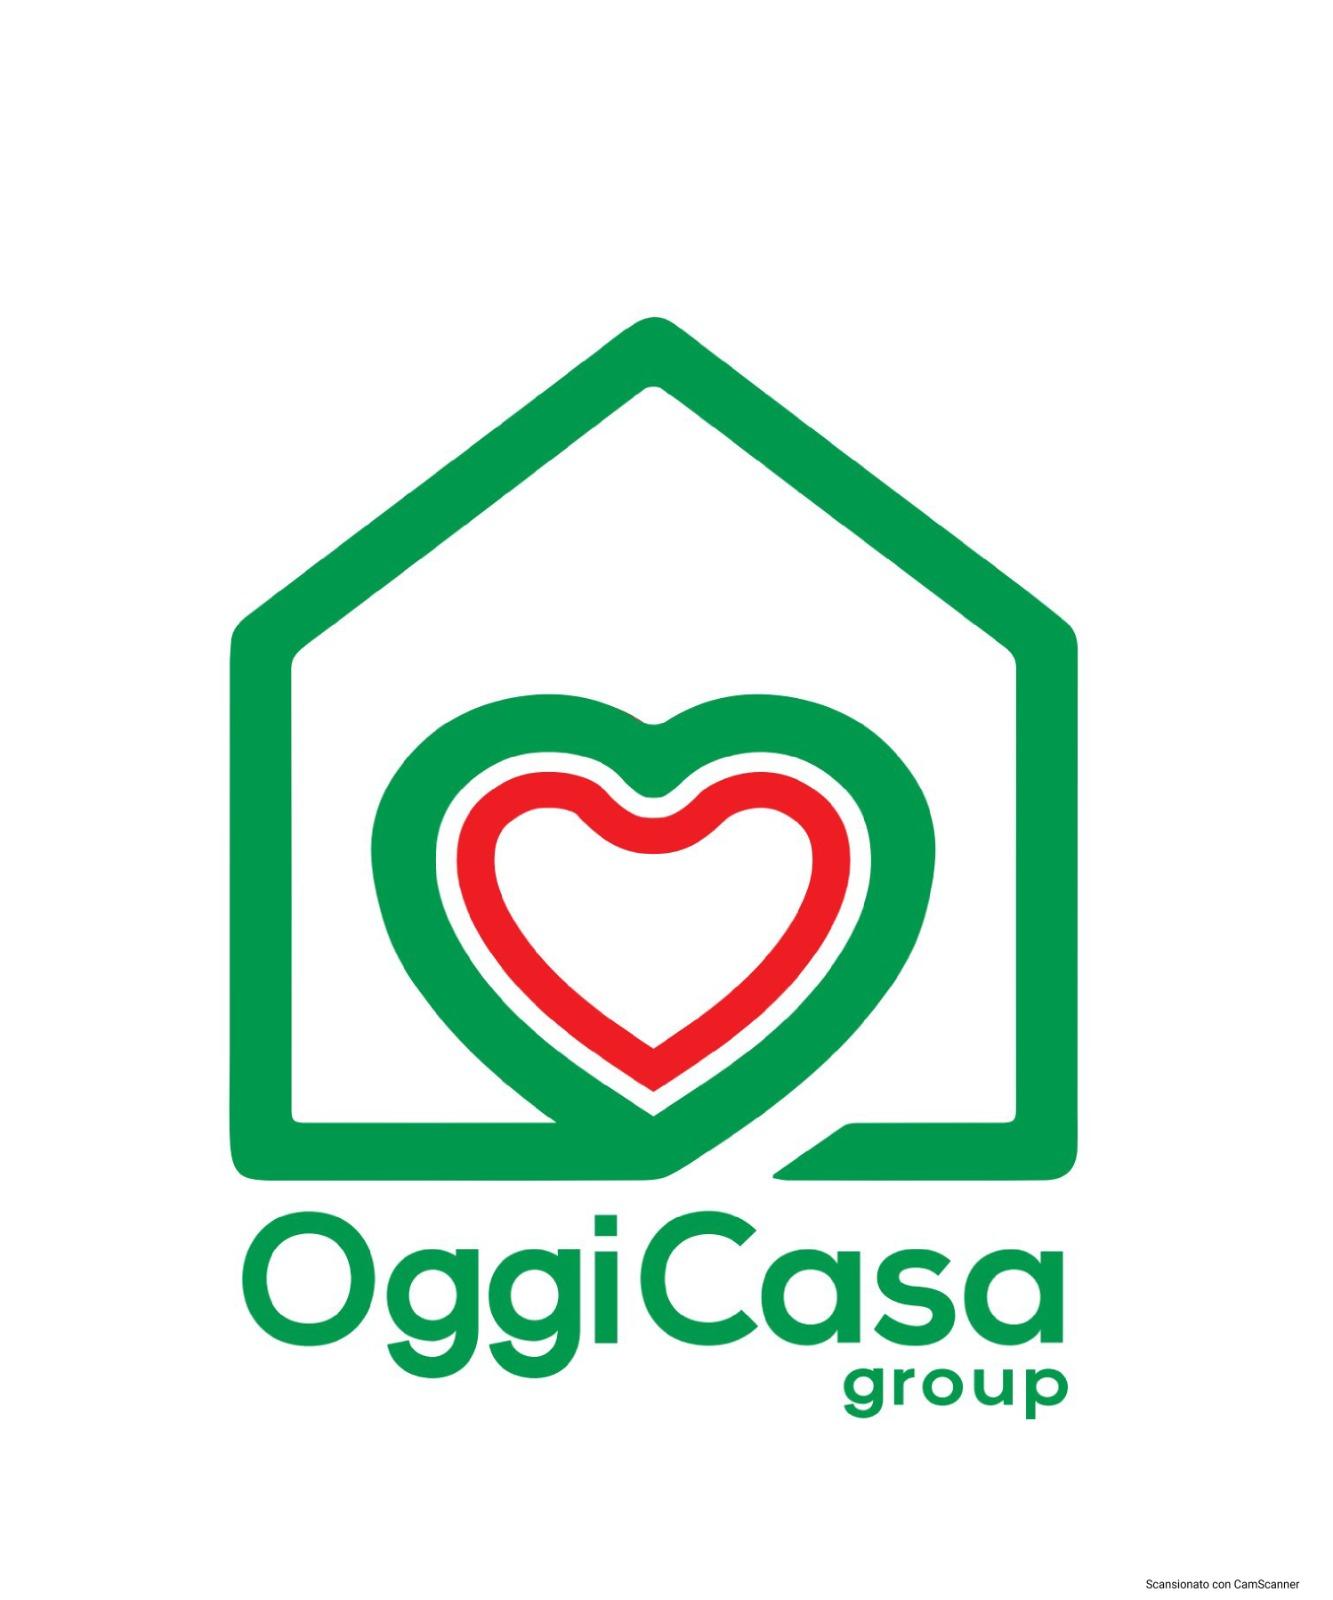 OggiCasa group srls